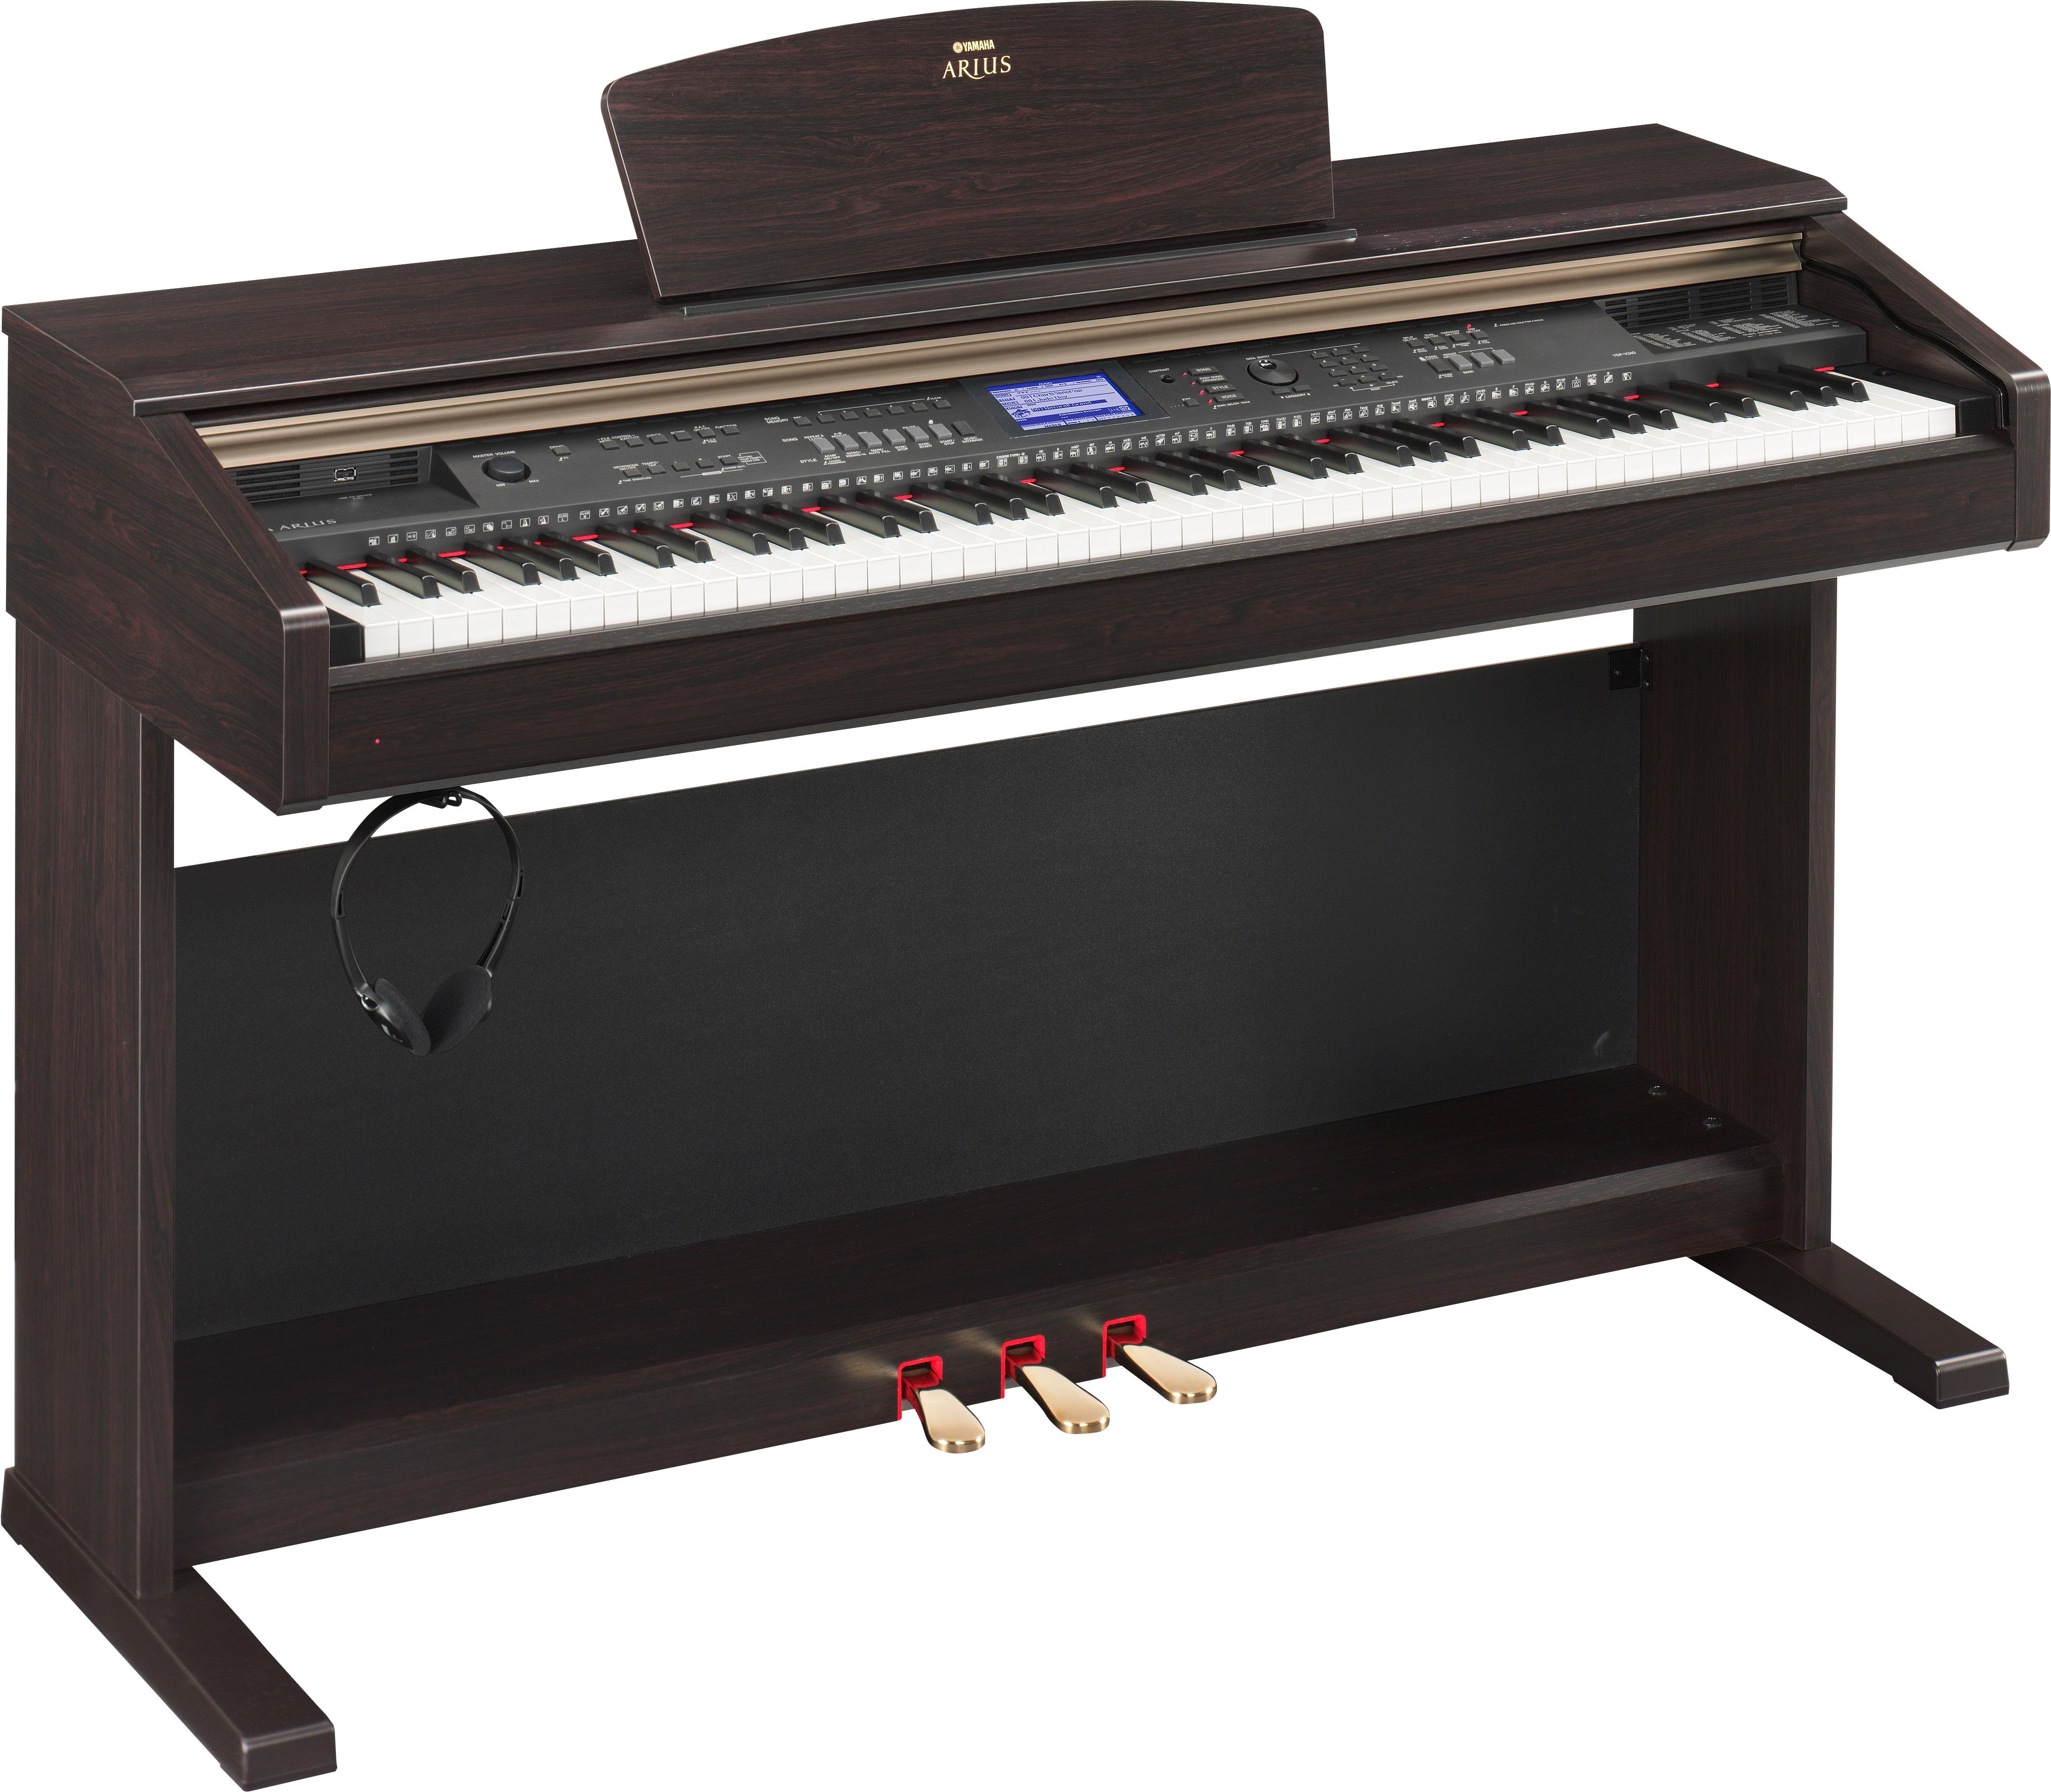 yamaha arius ydp v240 ensemble digital piano discontinued binary music. Black Bedroom Furniture Sets. Home Design Ideas